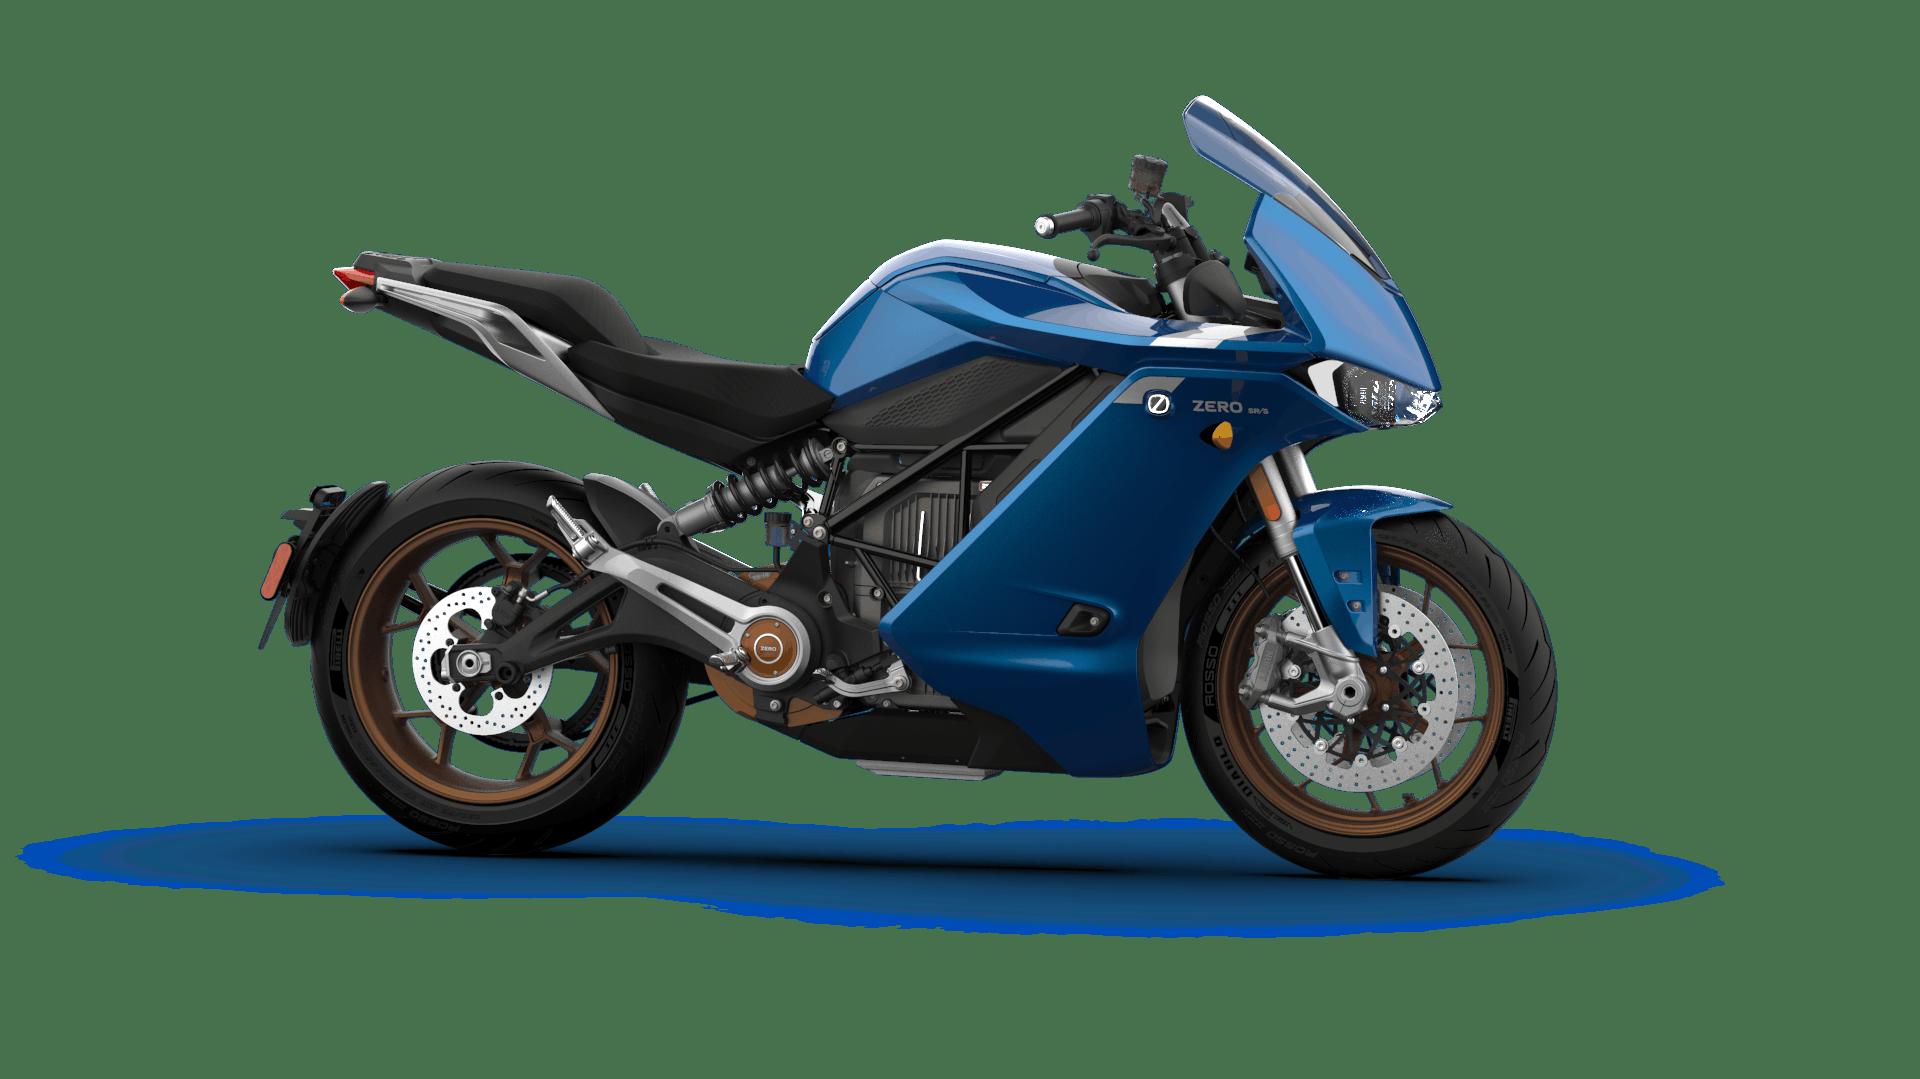 www.zeromotorcycles.com